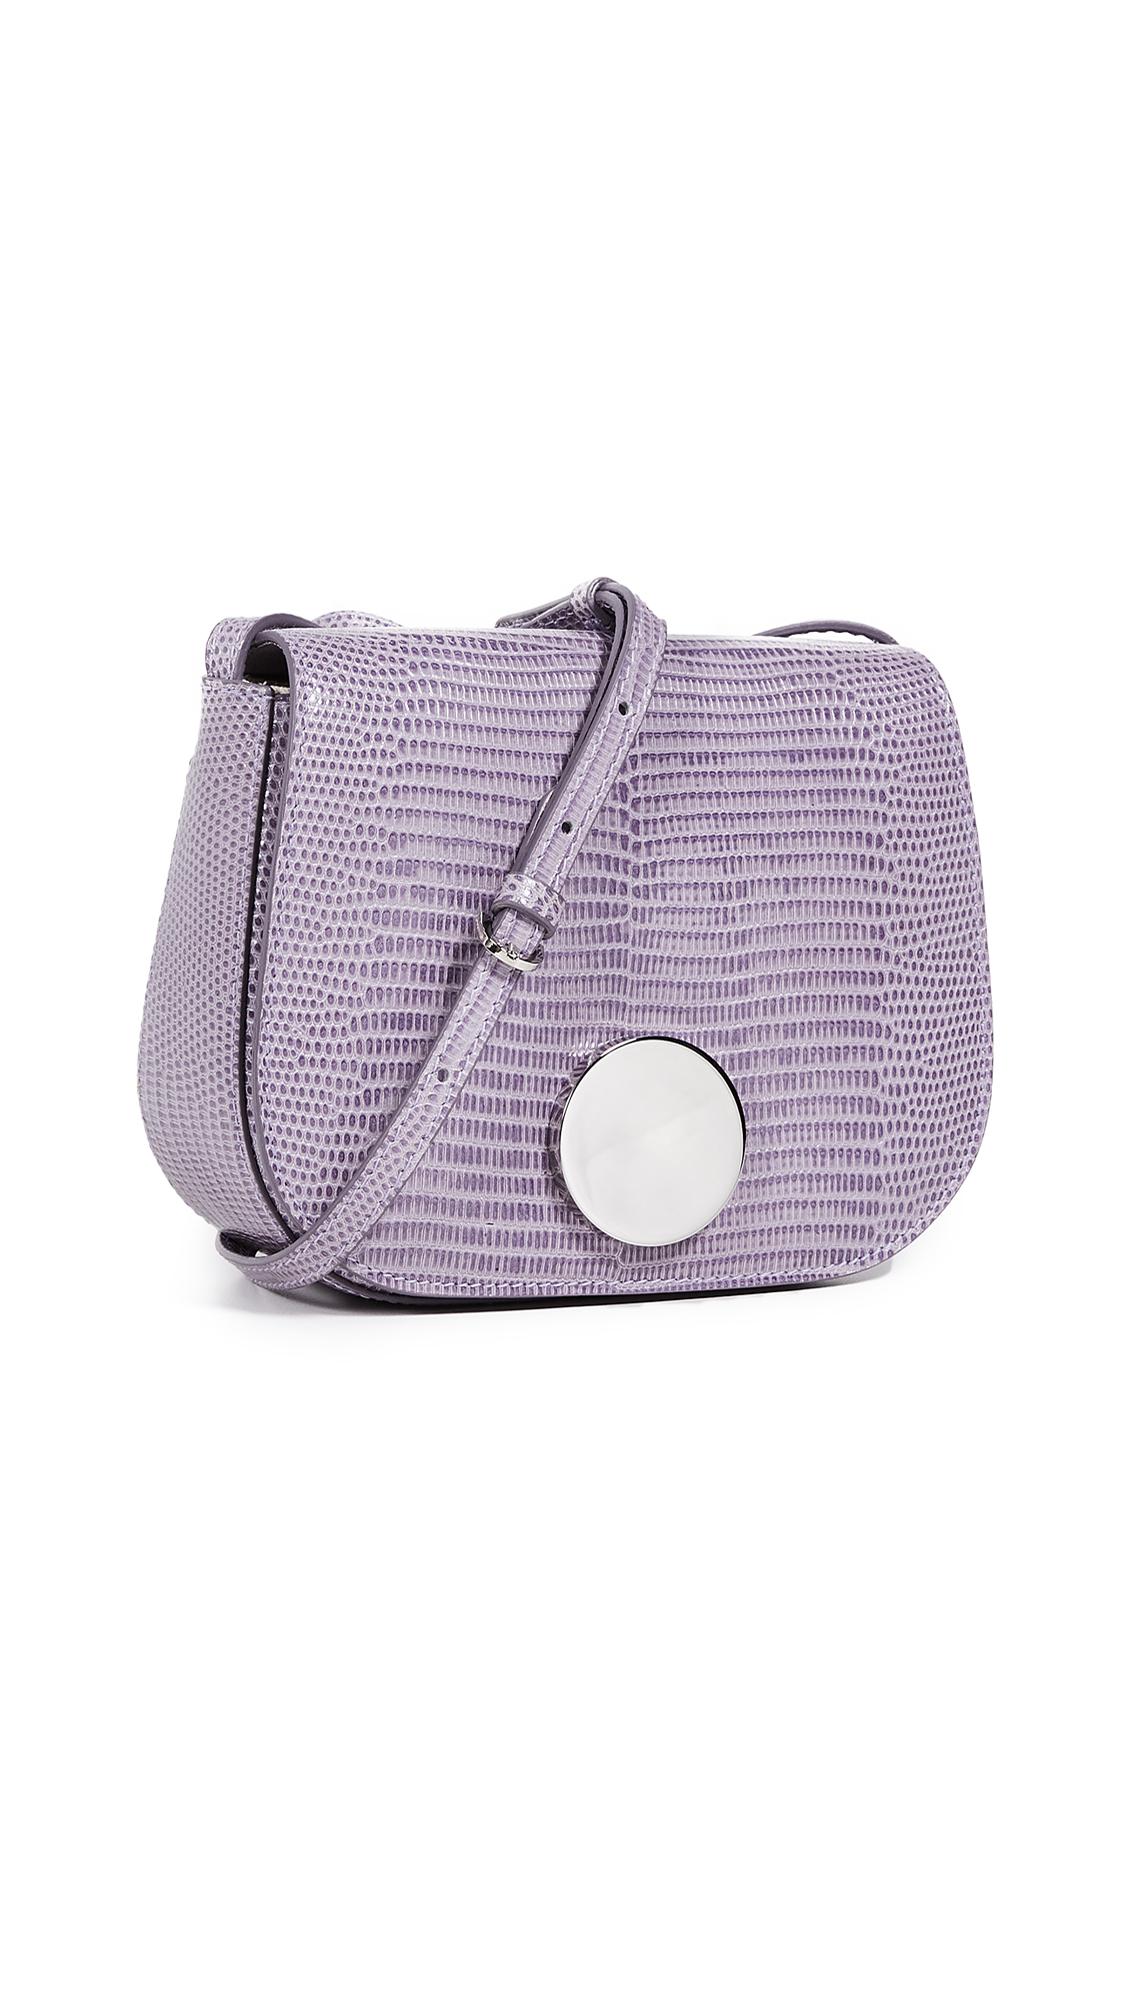 LITTLE LIFFNER Mini Saddle Bag in Lilac Lizard